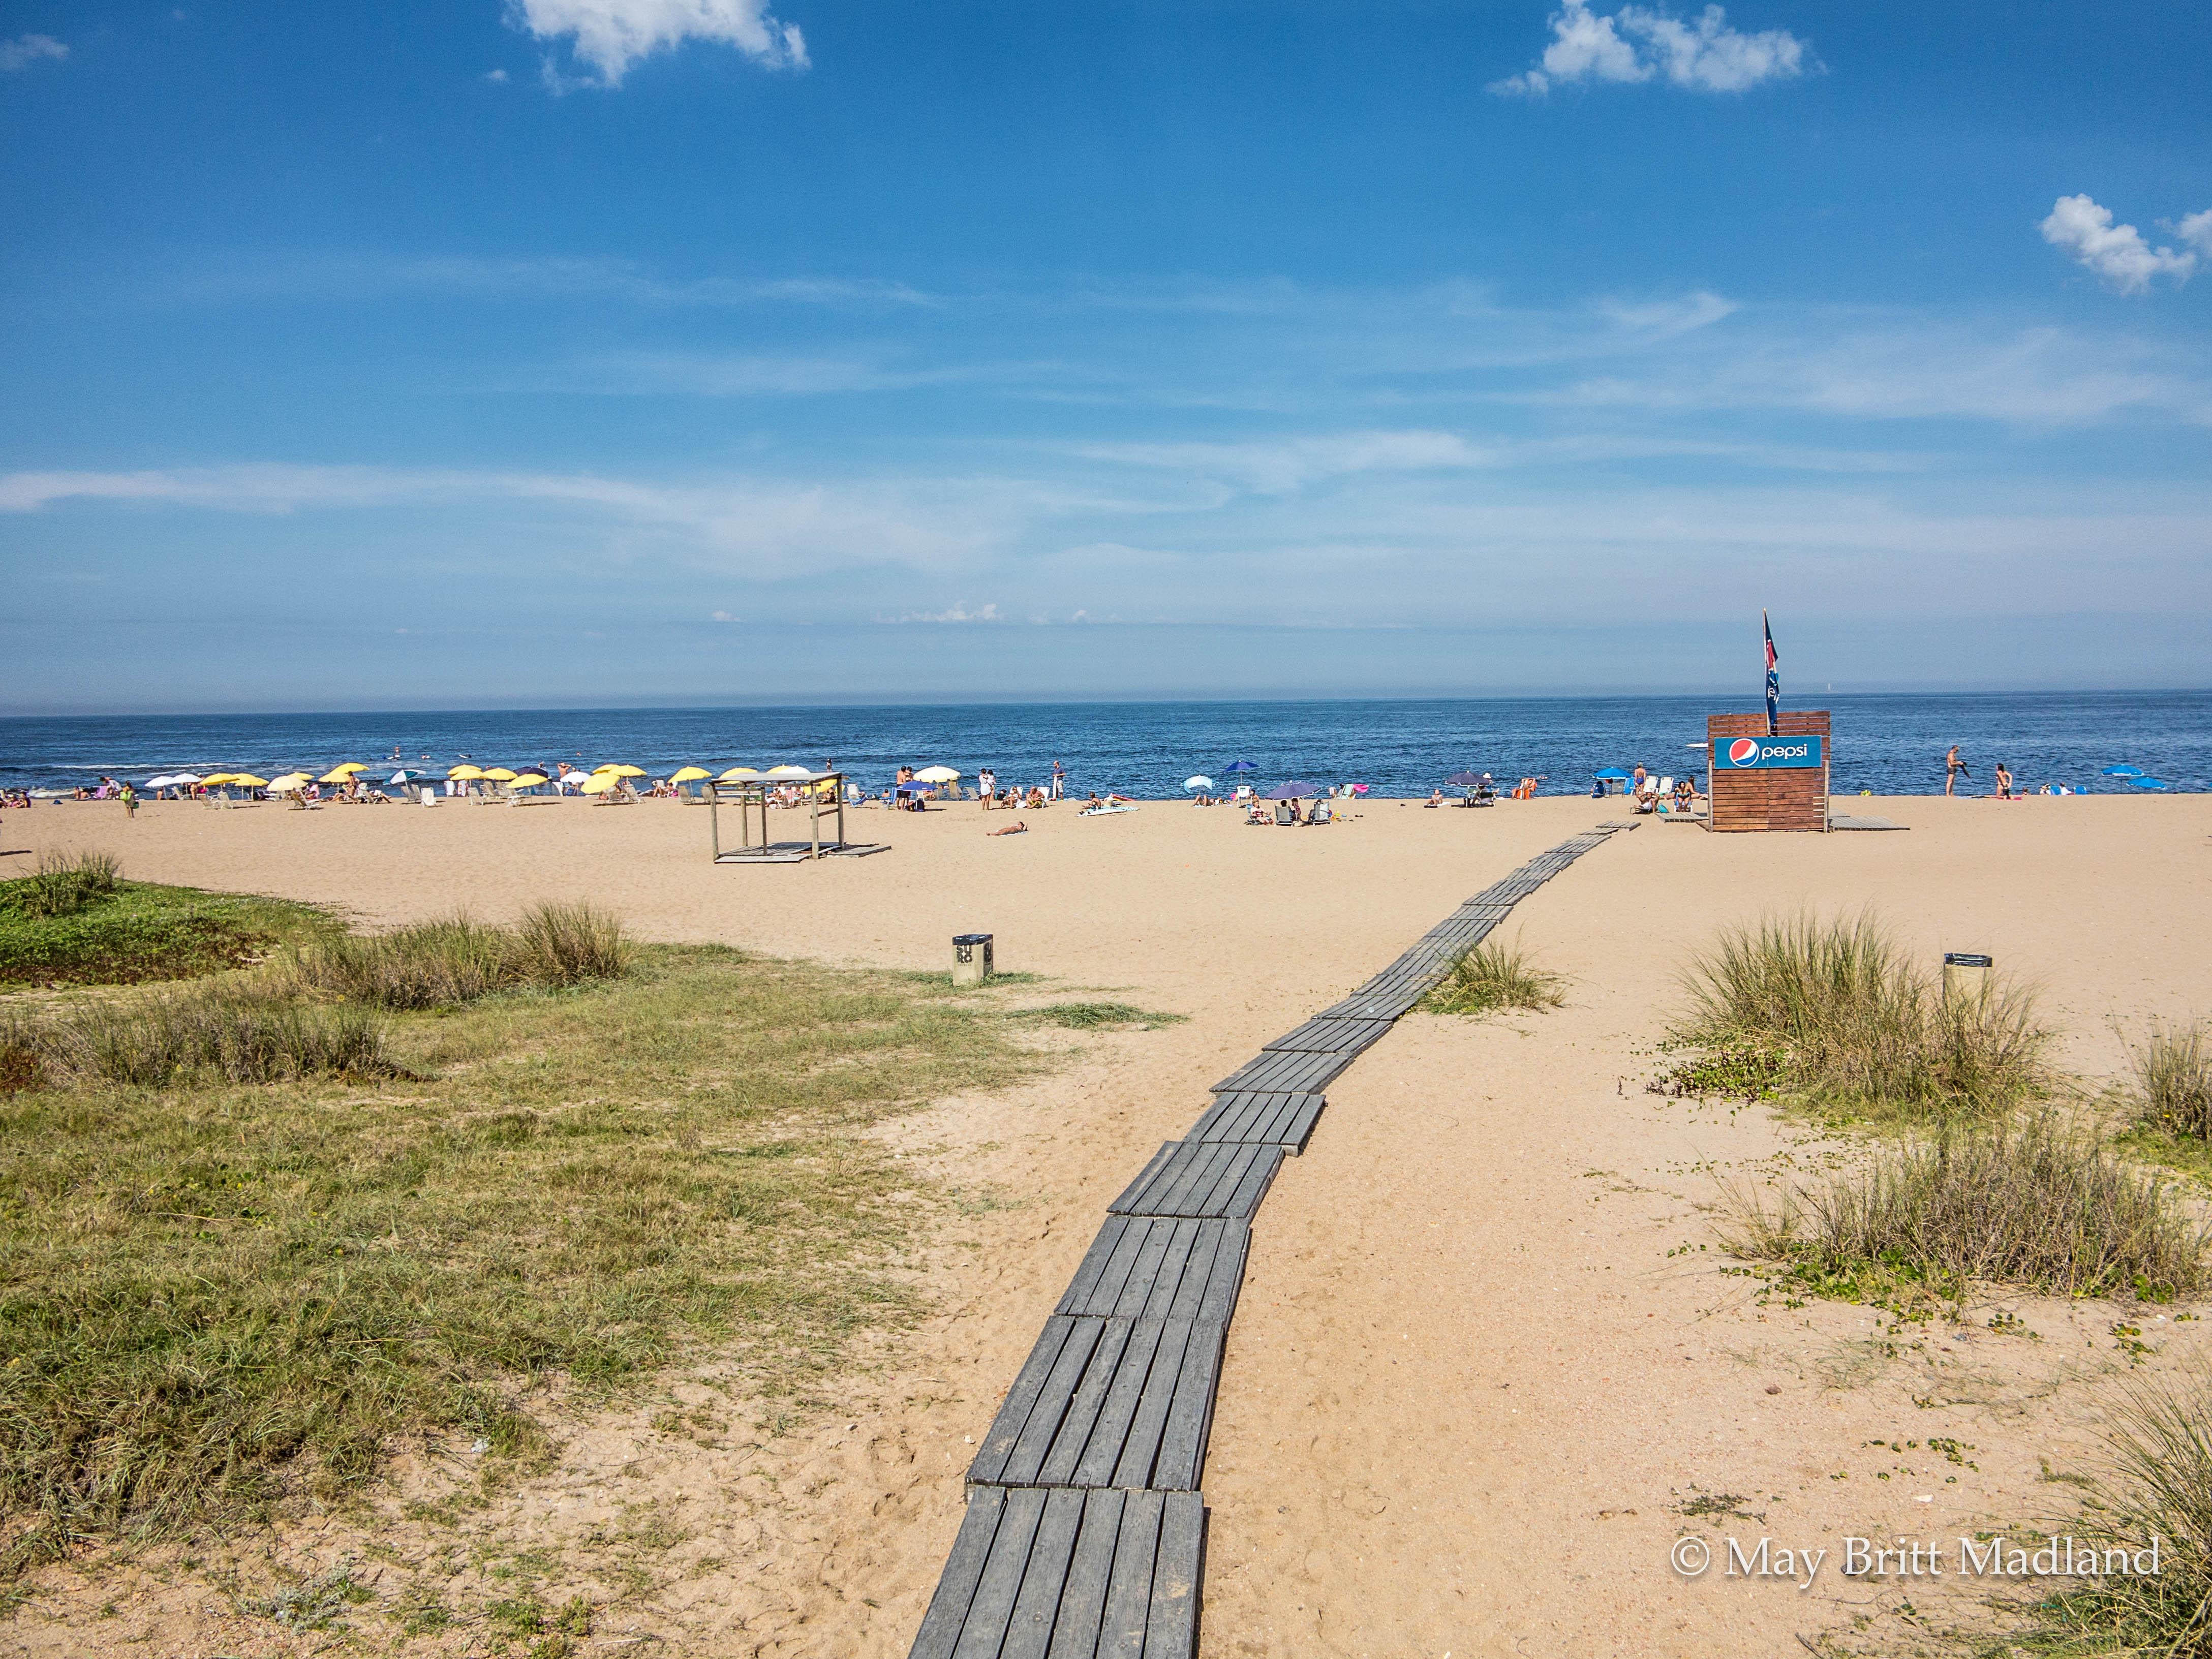 Bikini beach punta